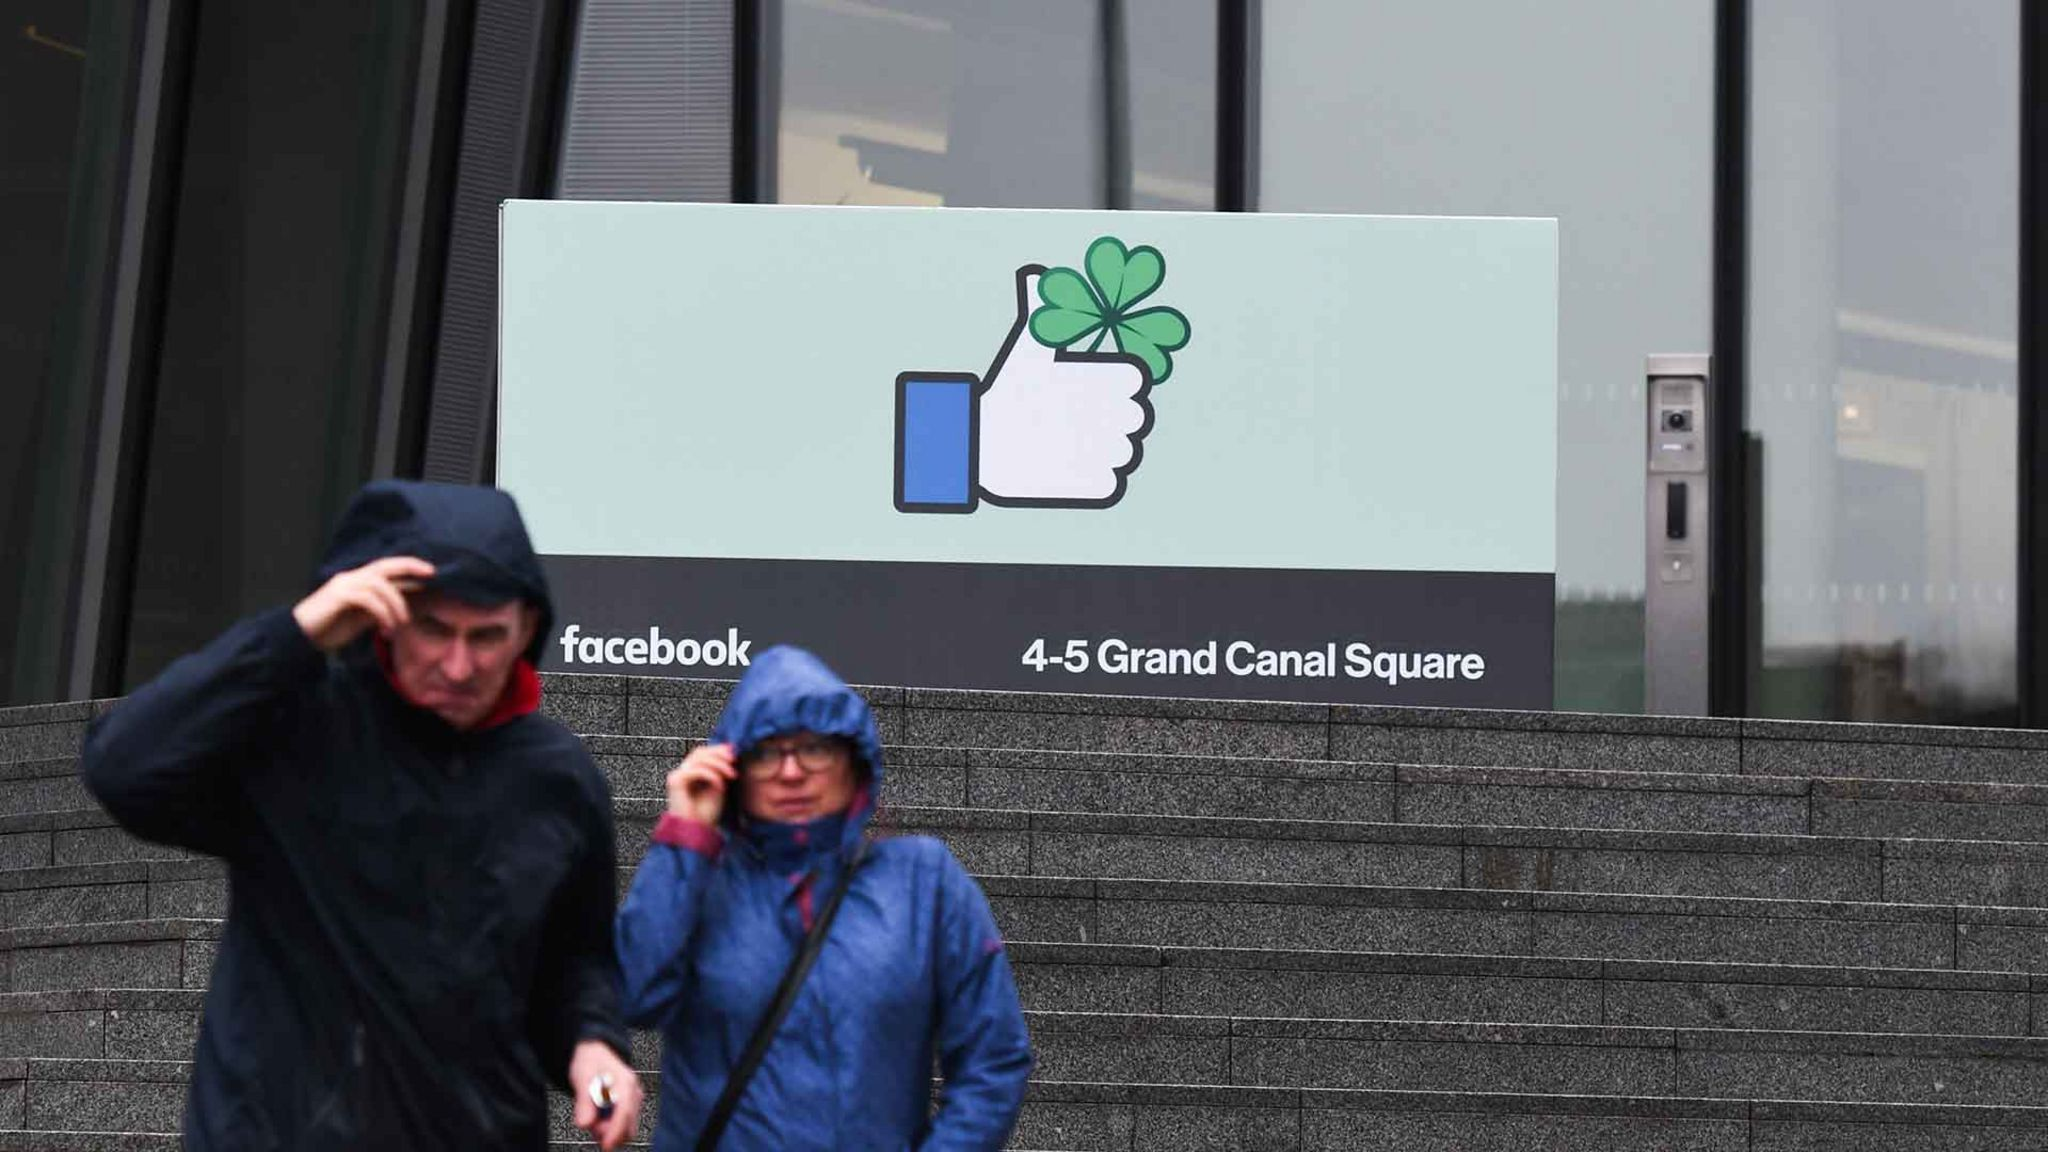 Штаб-квартира Facebook в Дублине G7